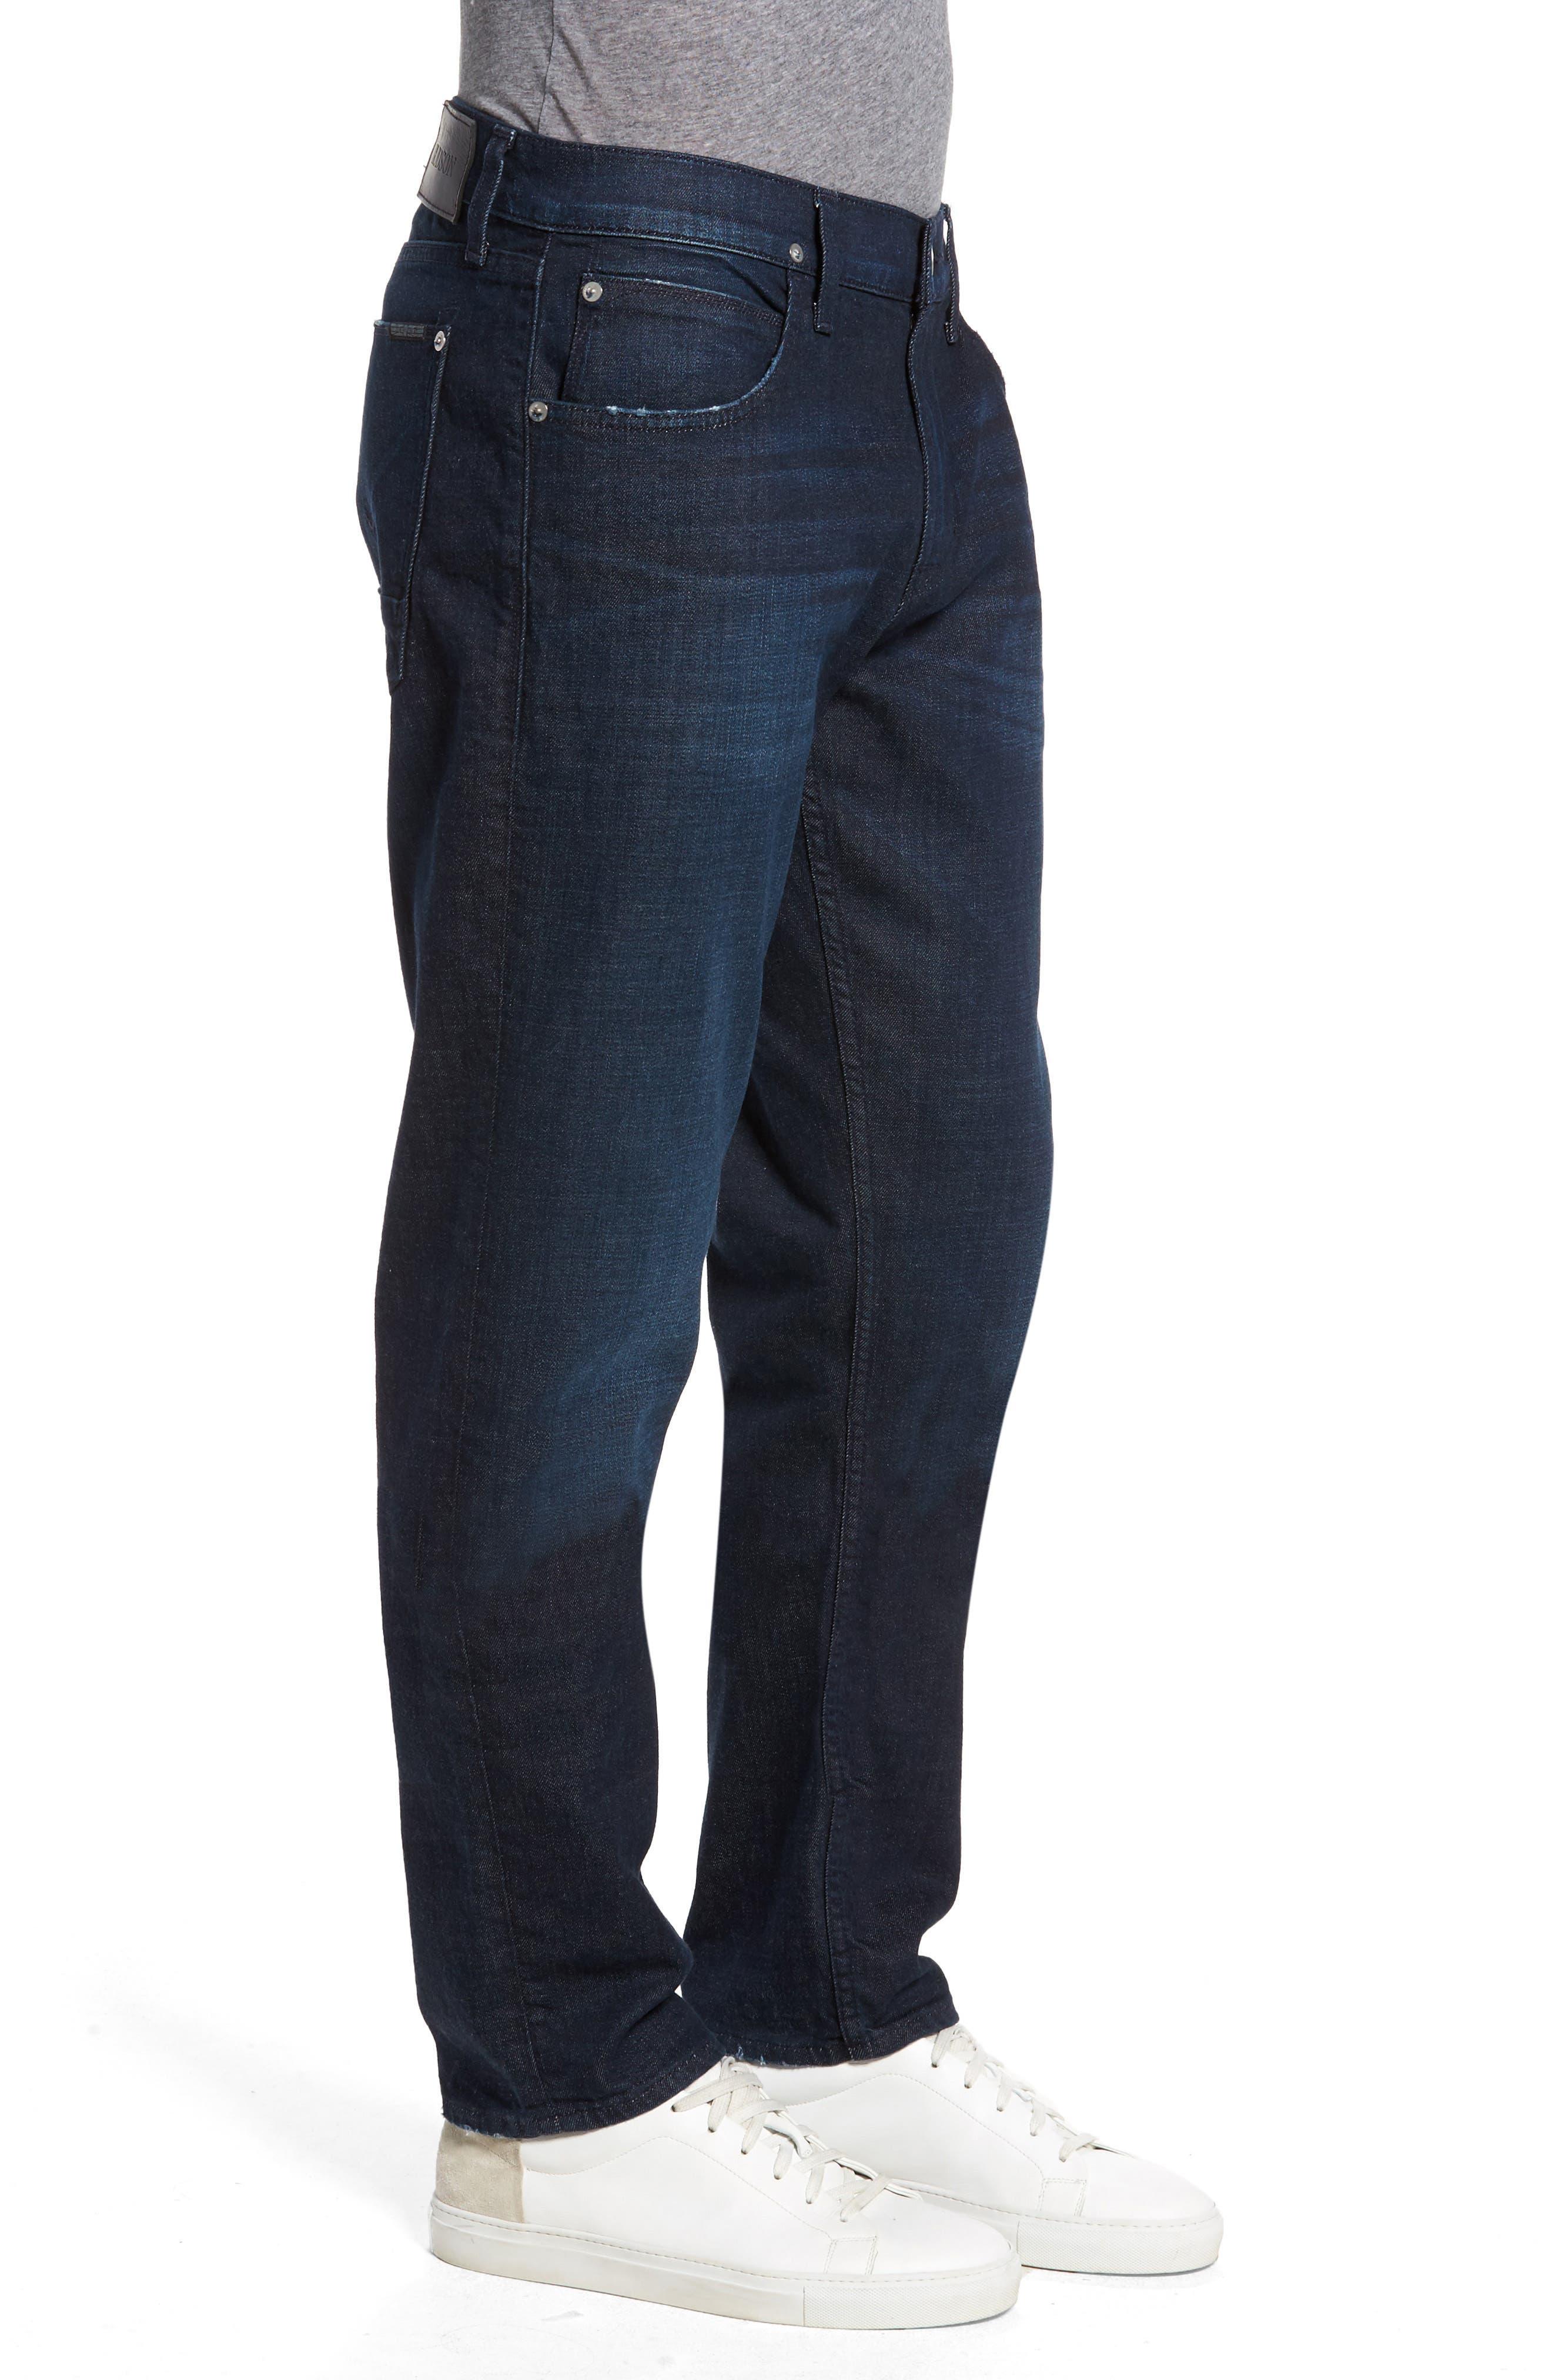 Alternate Image 3  - Hudson Jeans Blake Slim Fit Jeans (Evening Hush)